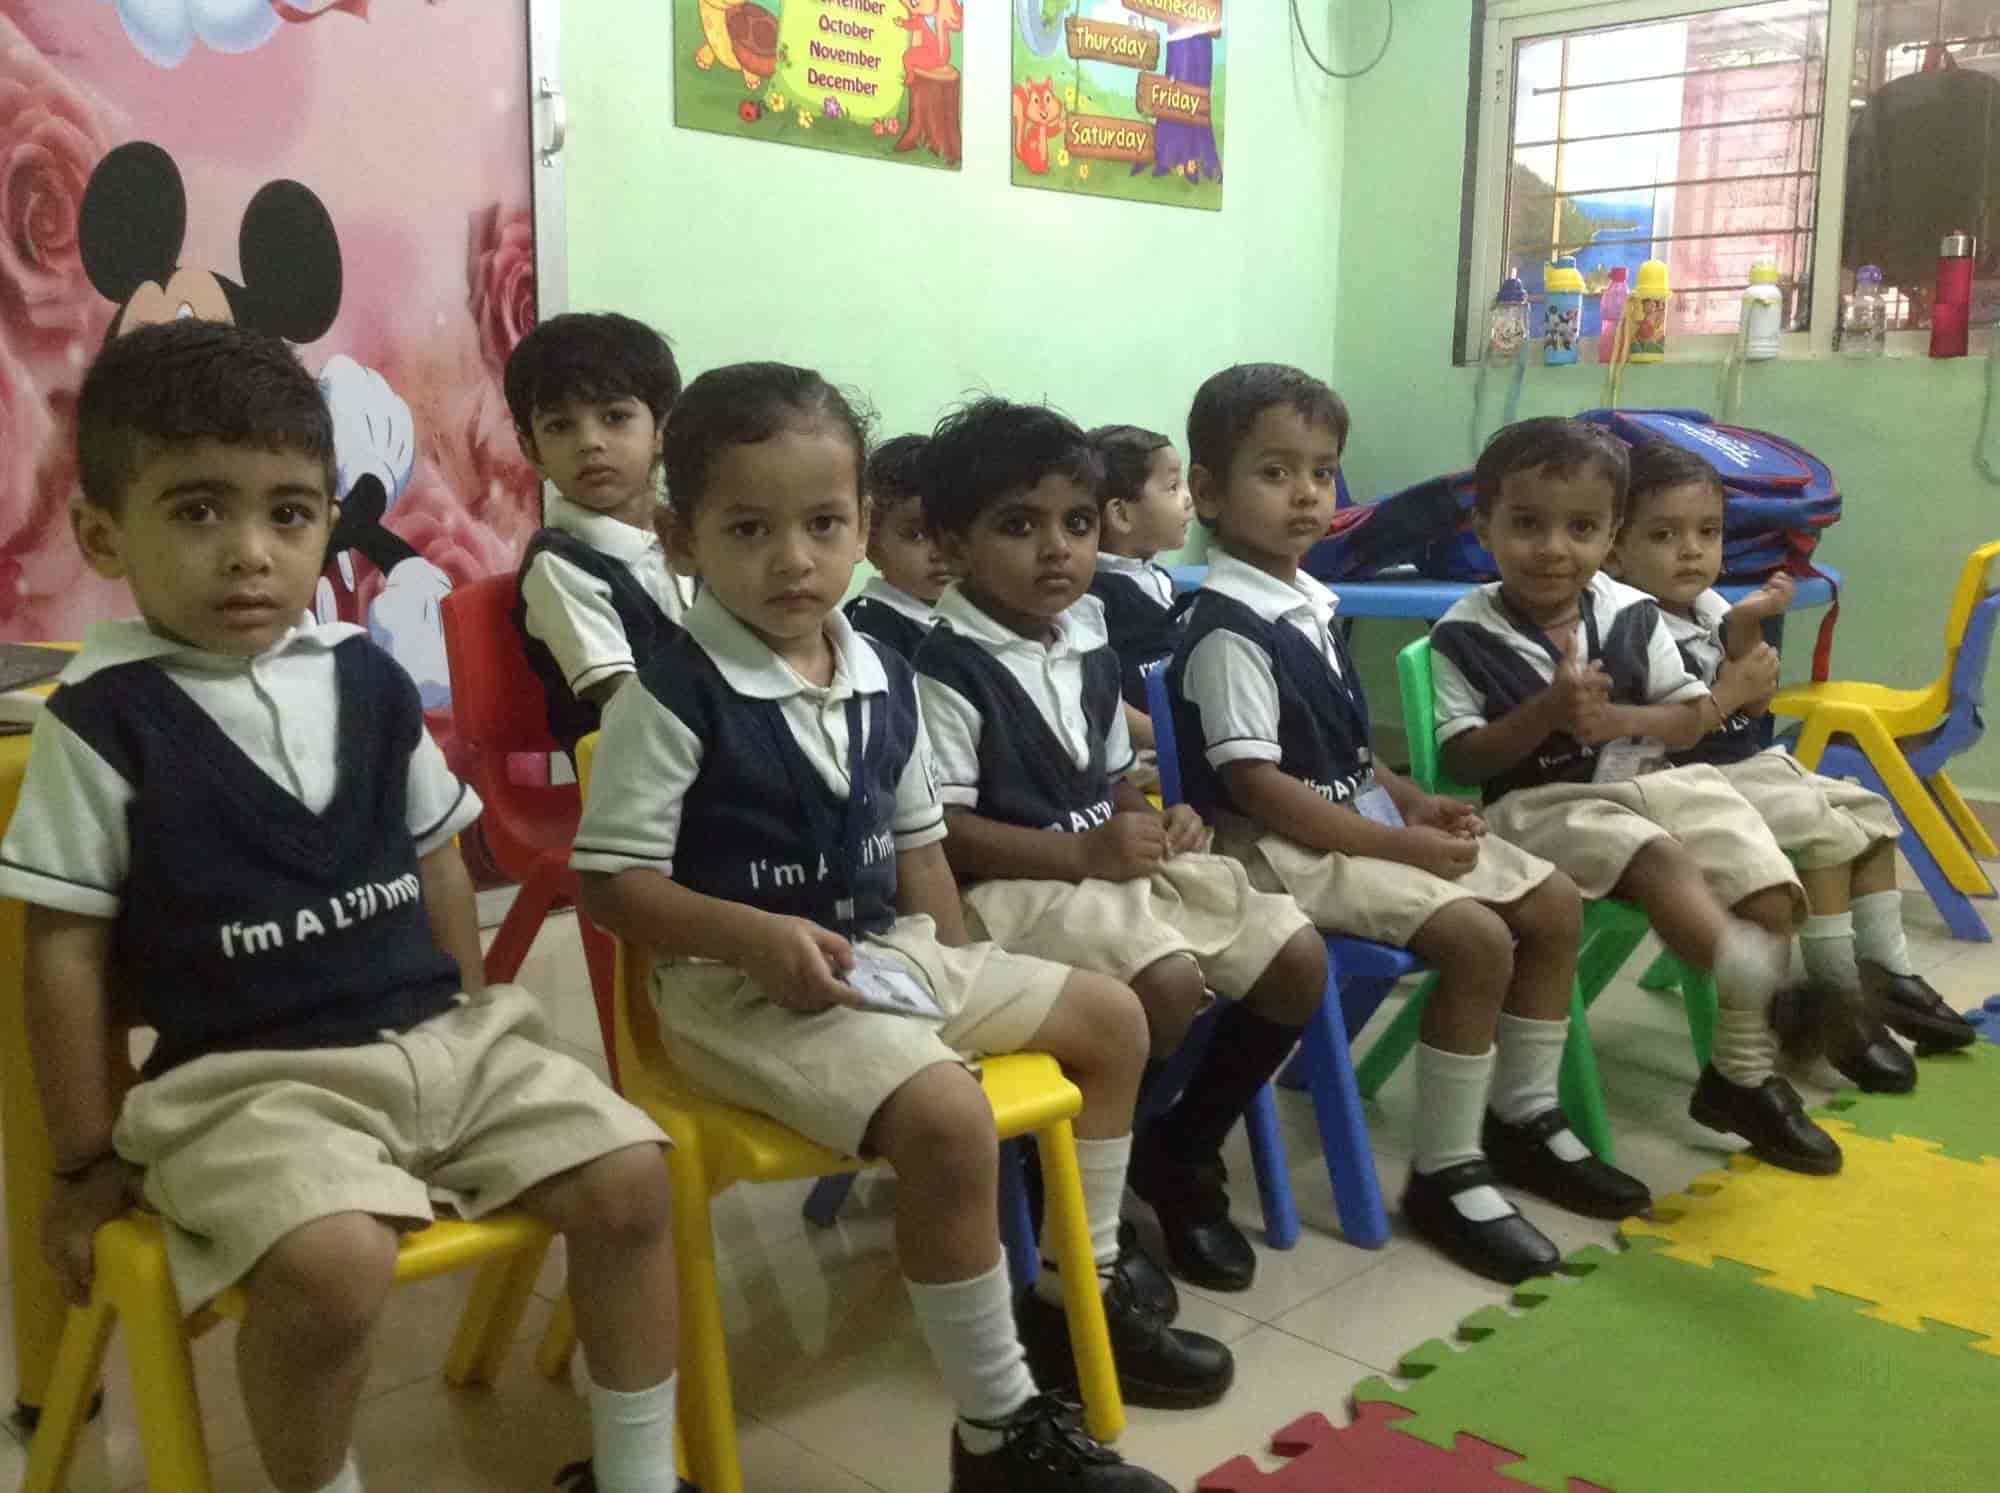 Baby Step's Pre School, Mira Road - Schools in Thane, Mumbai - Justdial